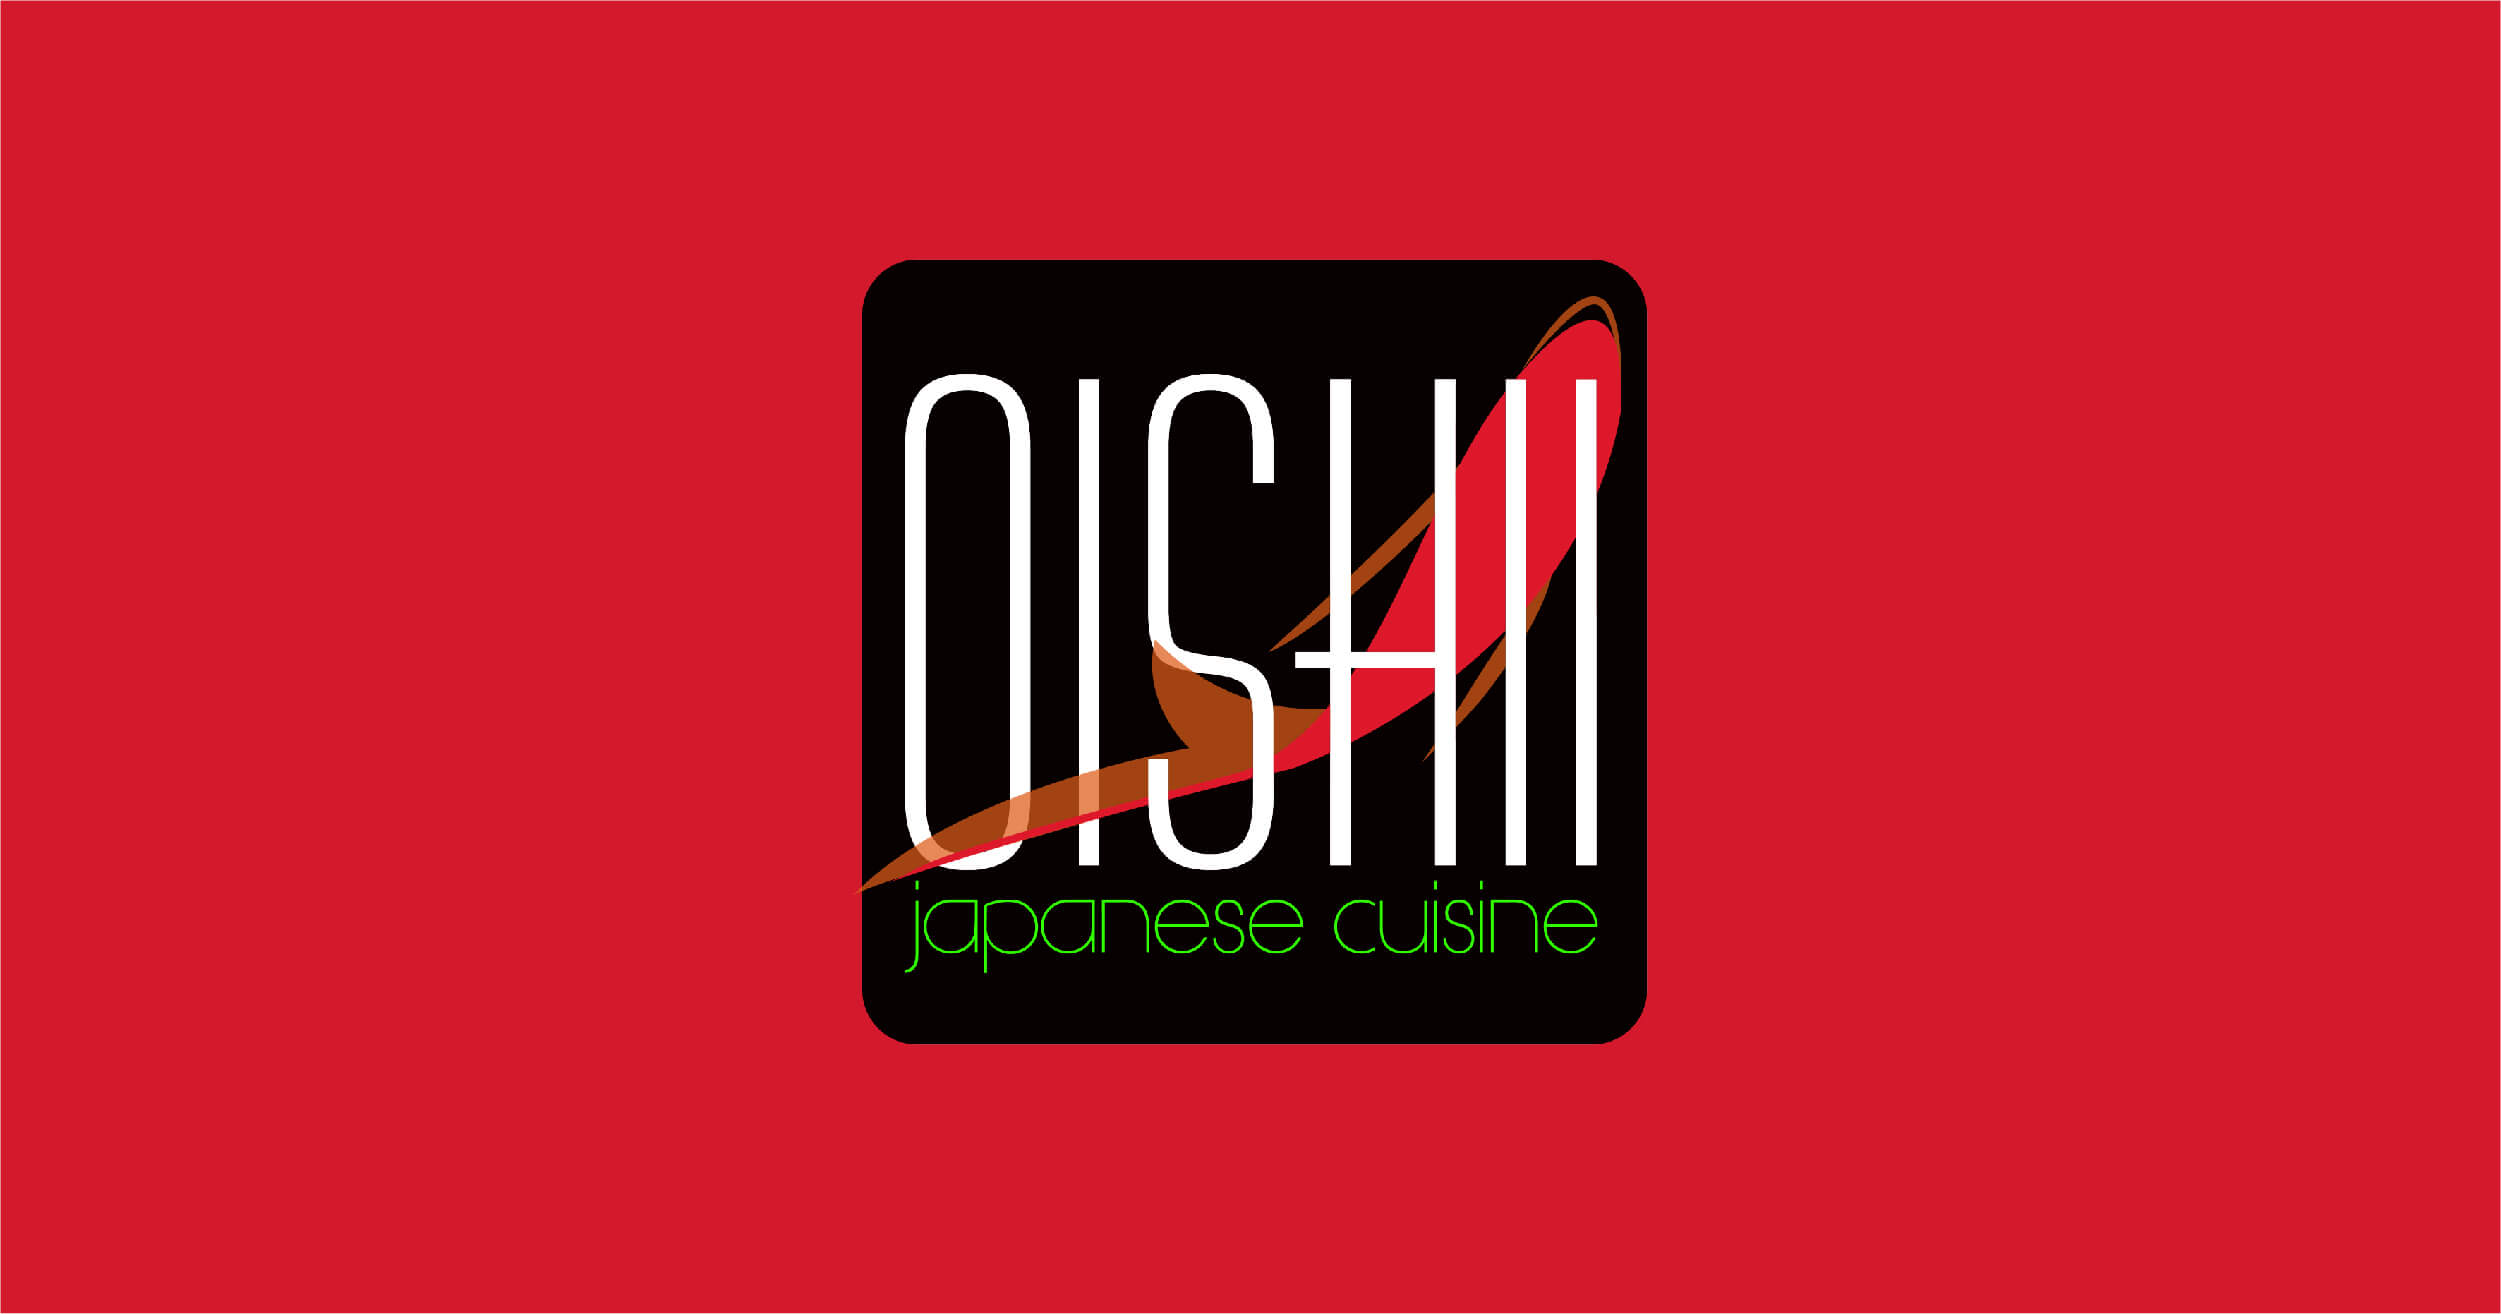 FullFrame-Photomkt-Portafolio-Cover-Oishii